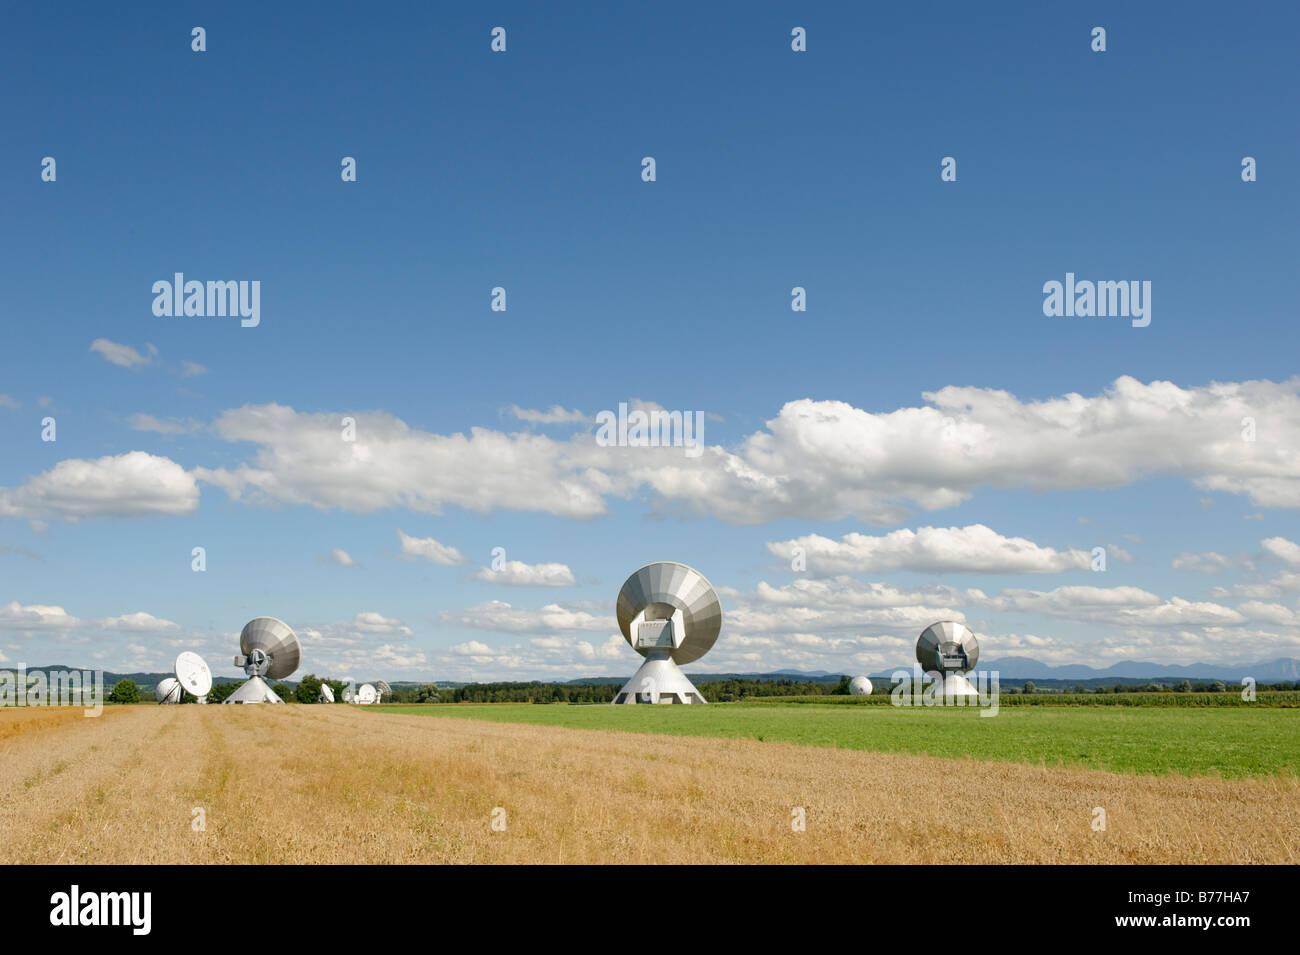 Earth station antennas, radio telescope, near Raisting, Upper Bavaria, Bavaria, Germany, Europe Stock Photo